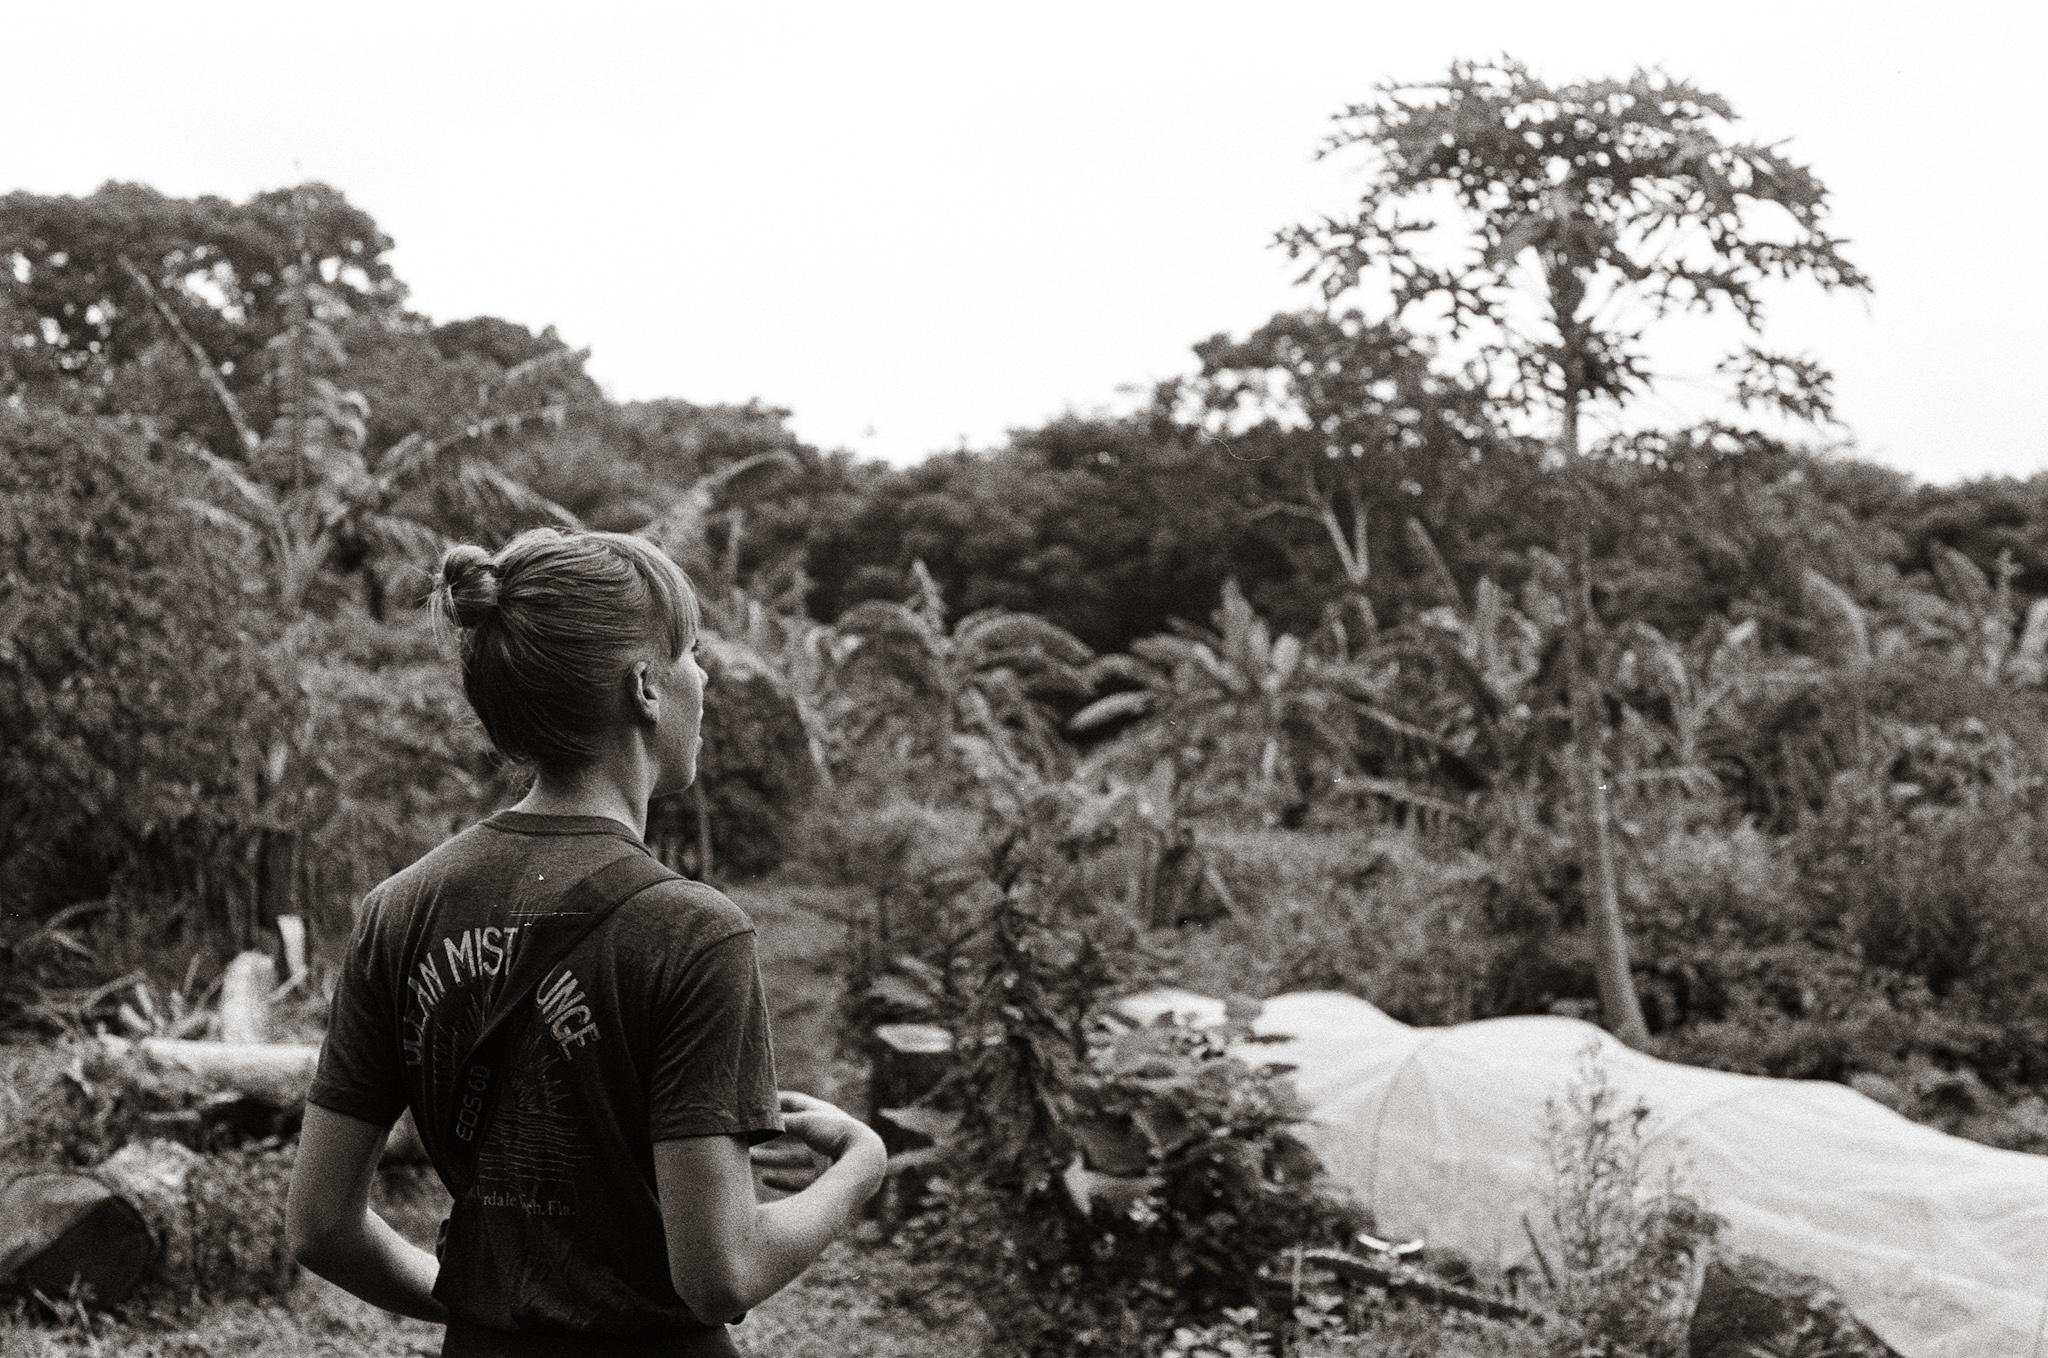 El Zopilote Permaculture Farm. Nicaragua, 2018.